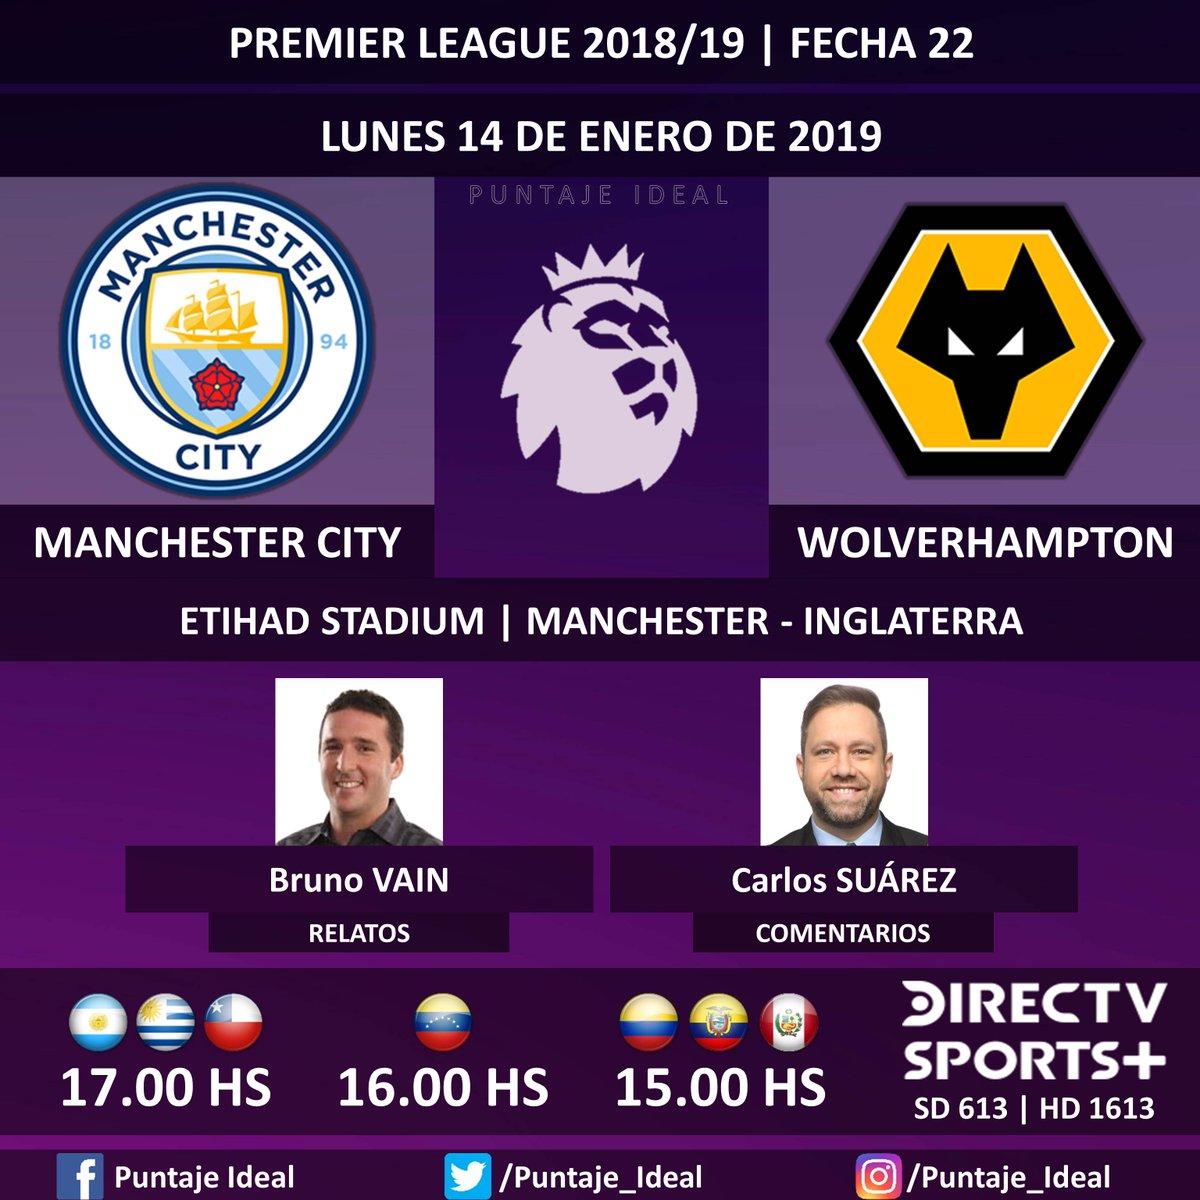 ⚽ #FútbolEnDIRECTV   #ManchesterCity vs. #Wolverhampton 🎙 Relatos: @brunovain  🎙 Comentarios: @CarlitosSuarez  📺 TV: @DIRECTVSports + Sudamérica (613 - 1613 HD)  🤳 #SoySportista - #PremierLeague 🏴 - #MCIWOL  Dale RT 🔃